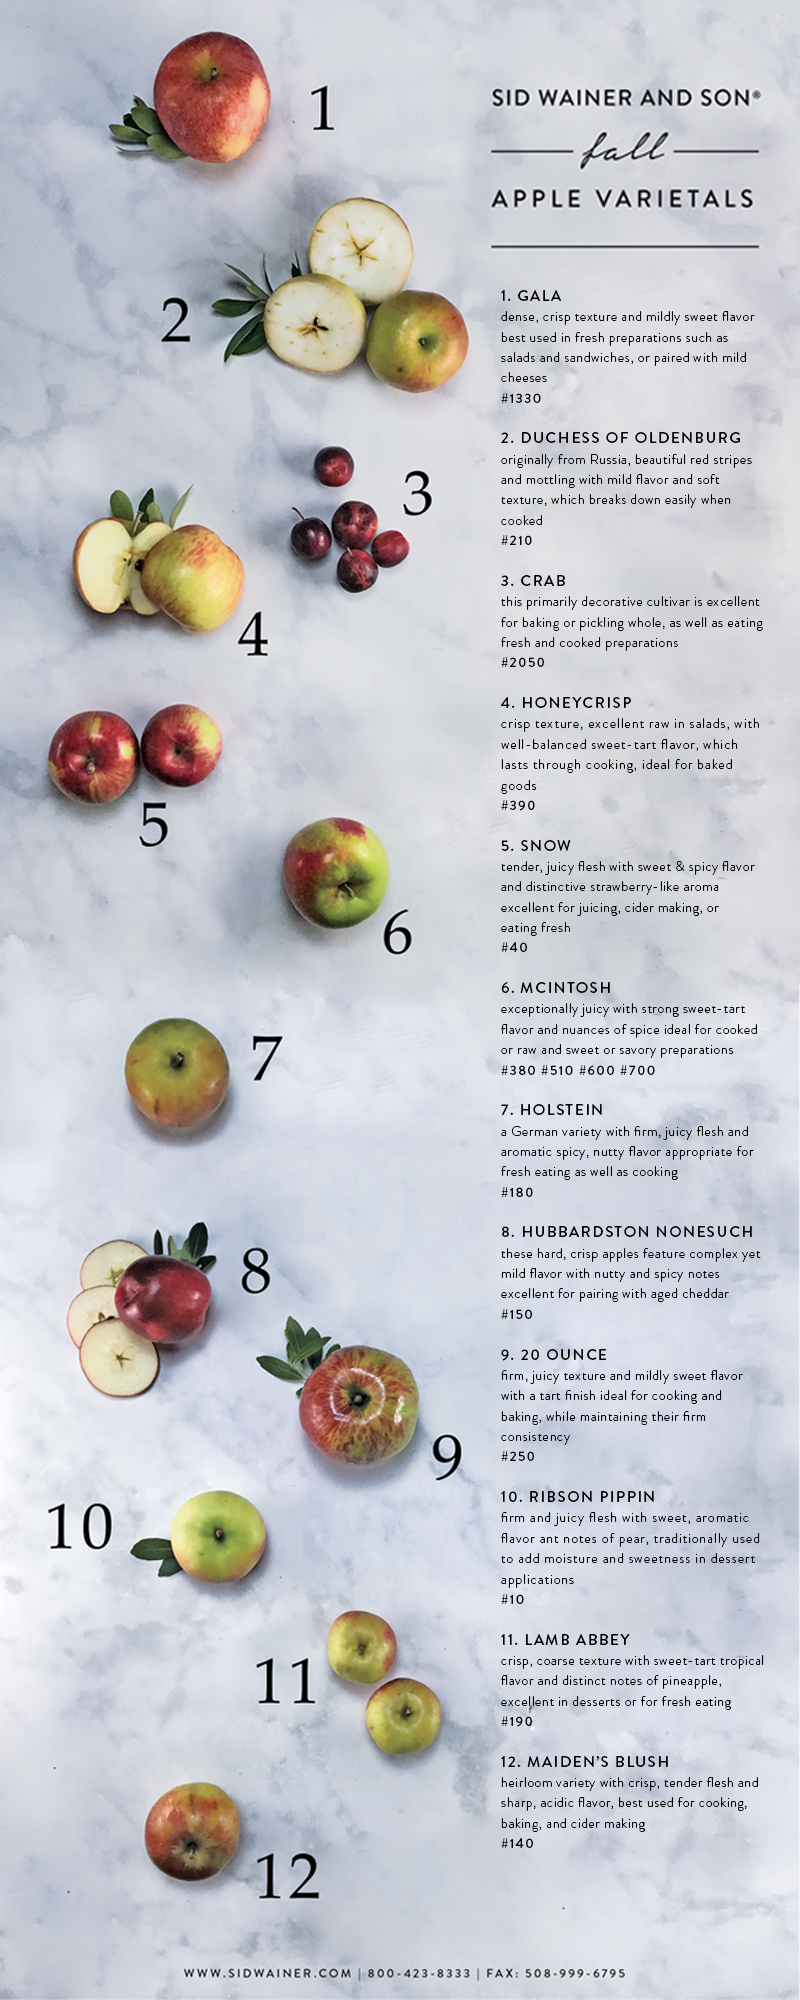 Fall Apples_Infographic.jpg